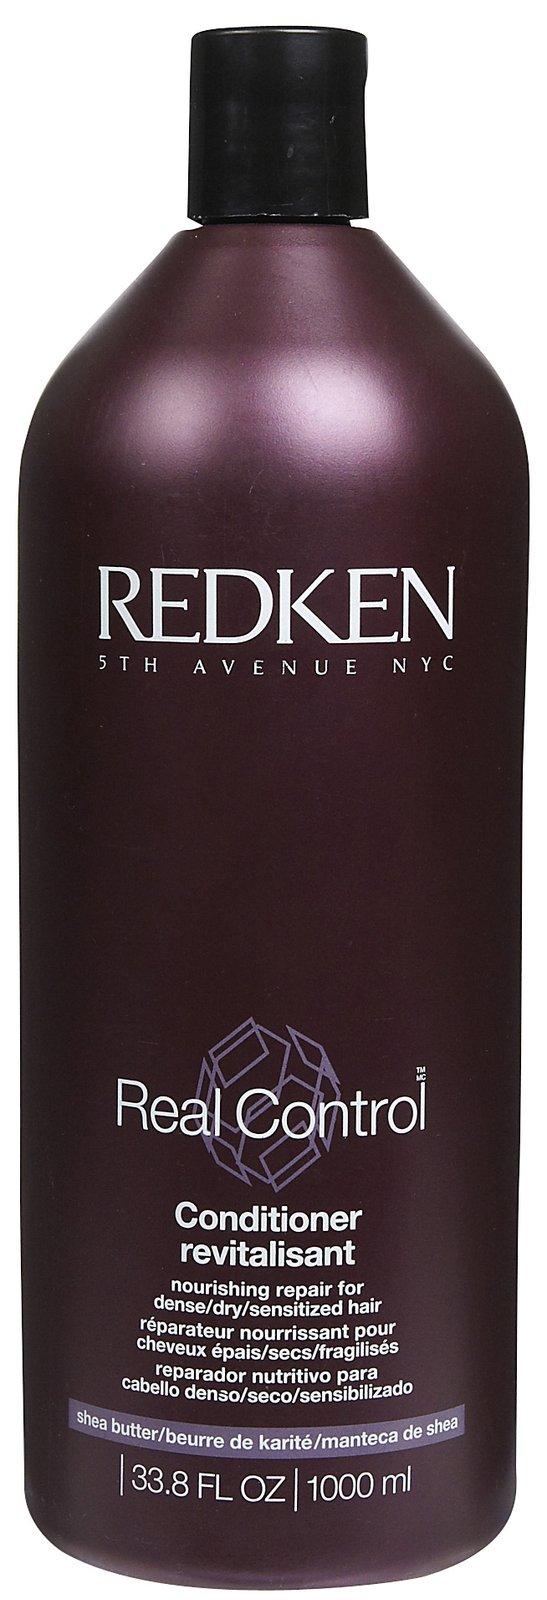 REDKEN ����������� �������� ����������������� / REAL CONTROL 1000��~